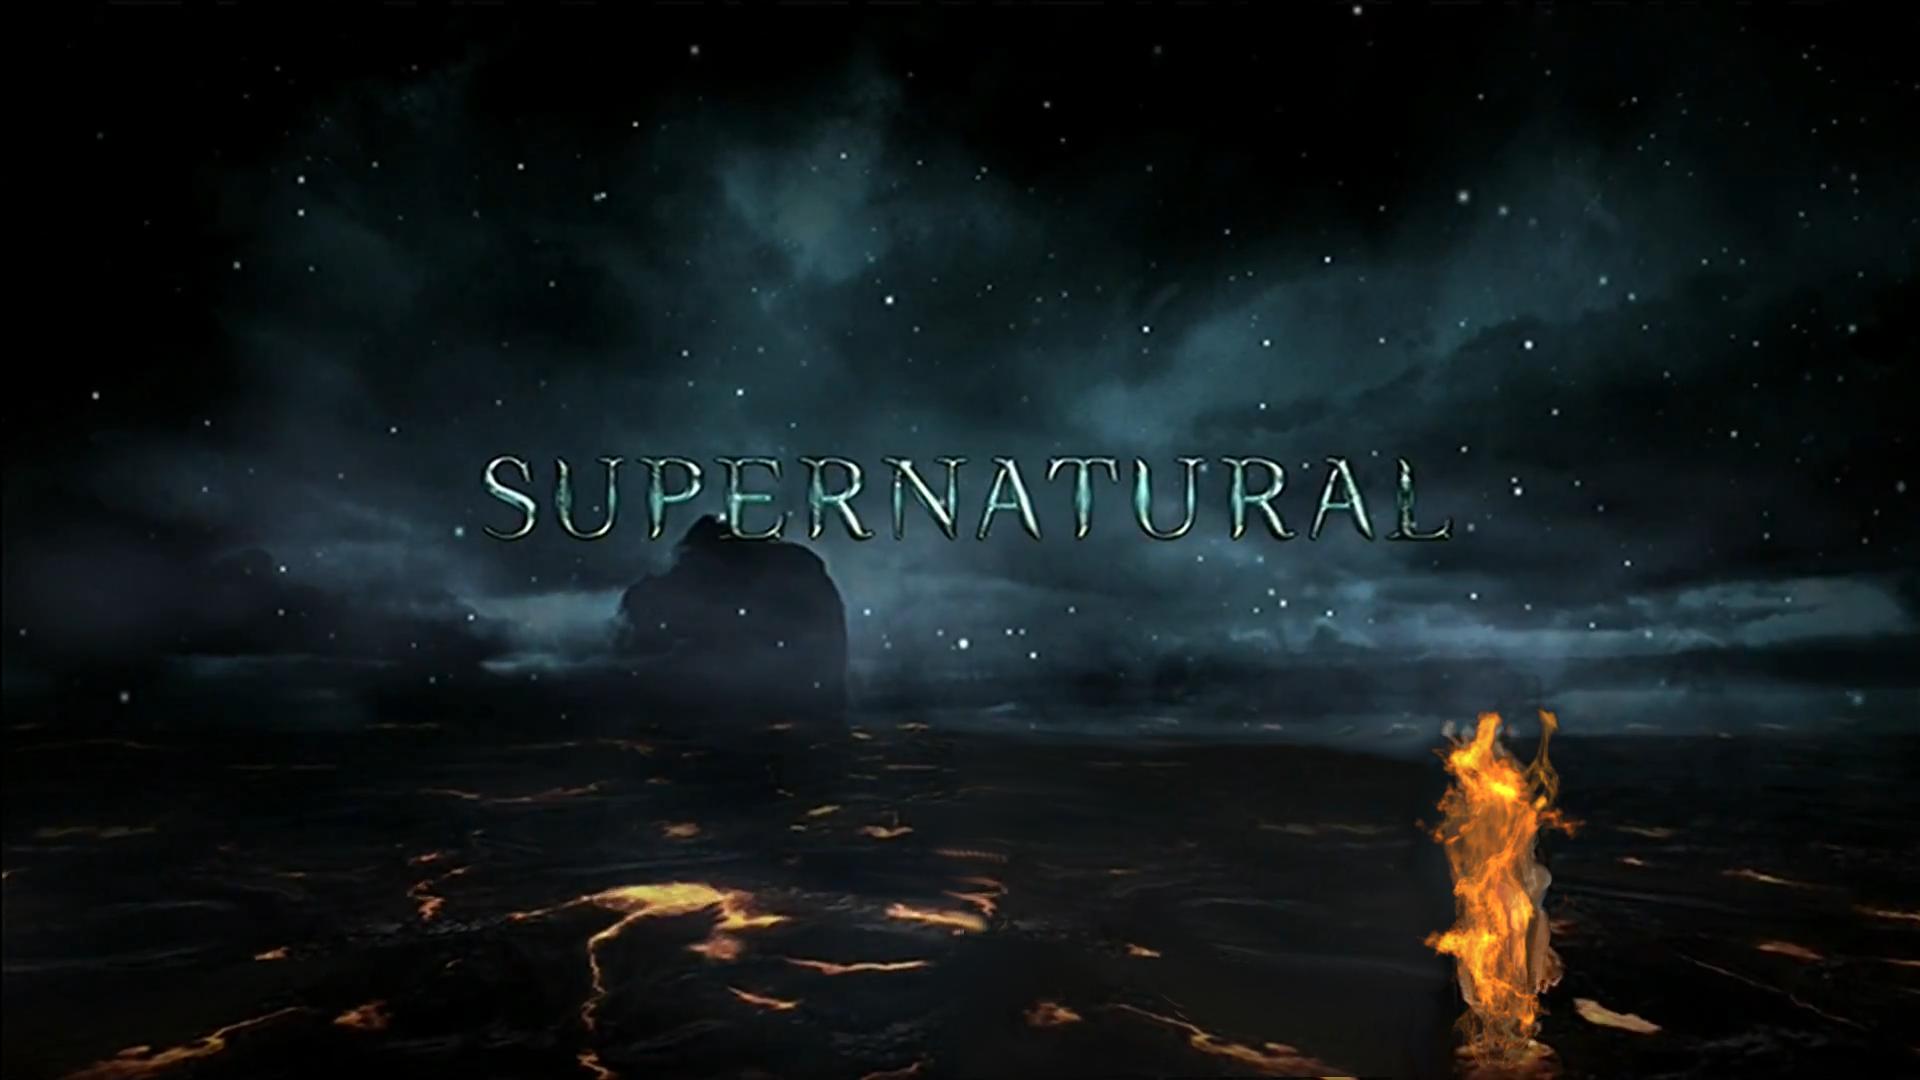 Supernatural Season 8 Wallpaper 2 by Winchester7314 1920x1080